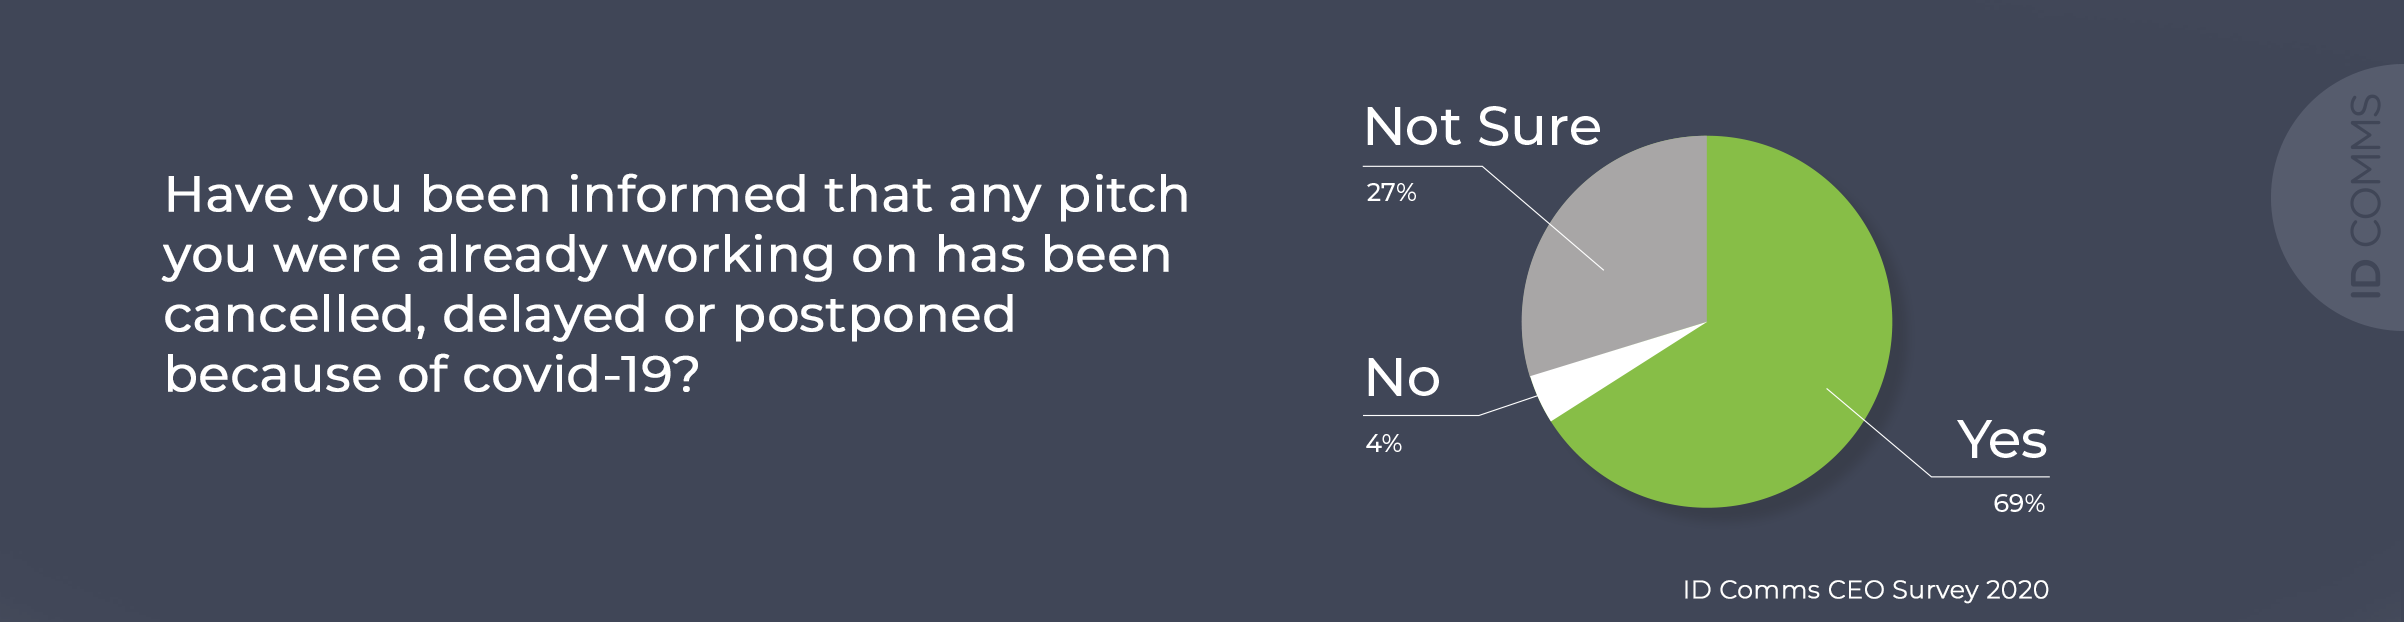 ID Comms CEO survey question 1-2